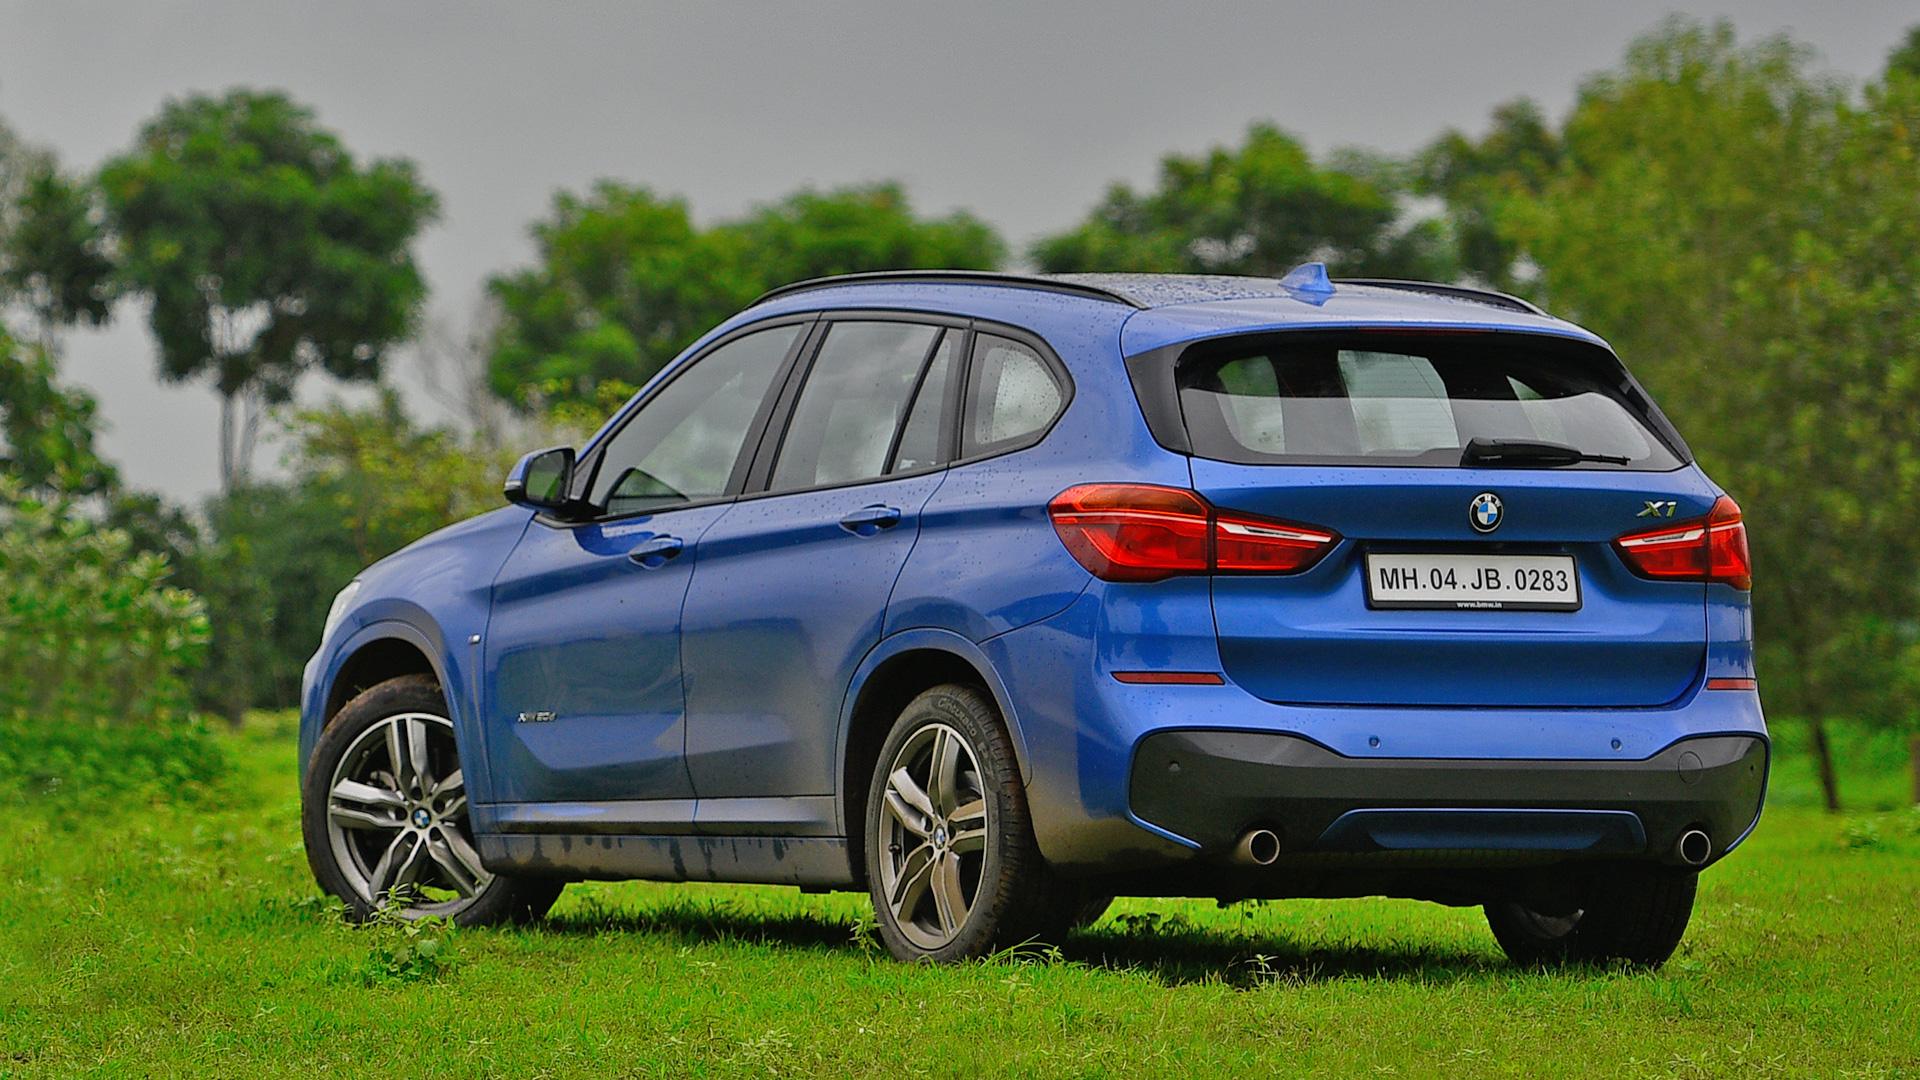 BMW X1 2018 XDrive 20d M Sport Exterior Car Photos - Overdrive